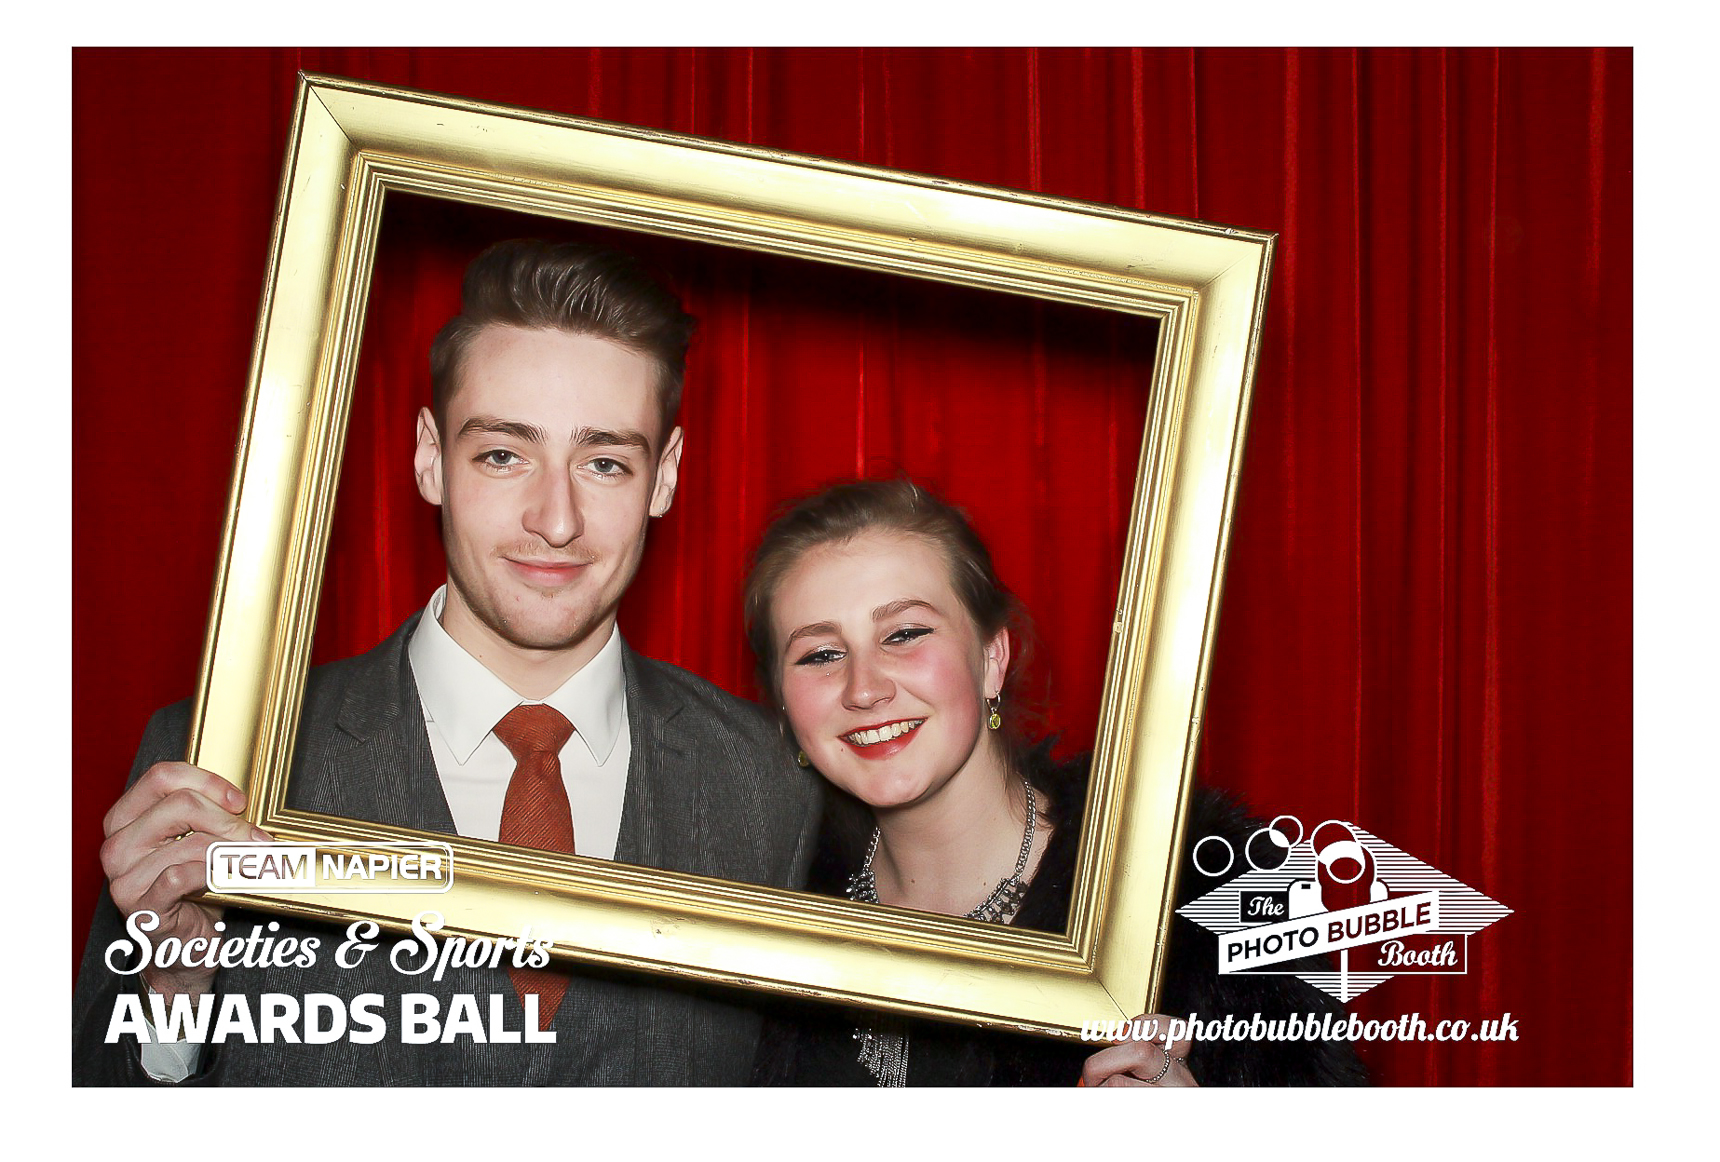 Napier Societies & Sports Awards_12.JPG